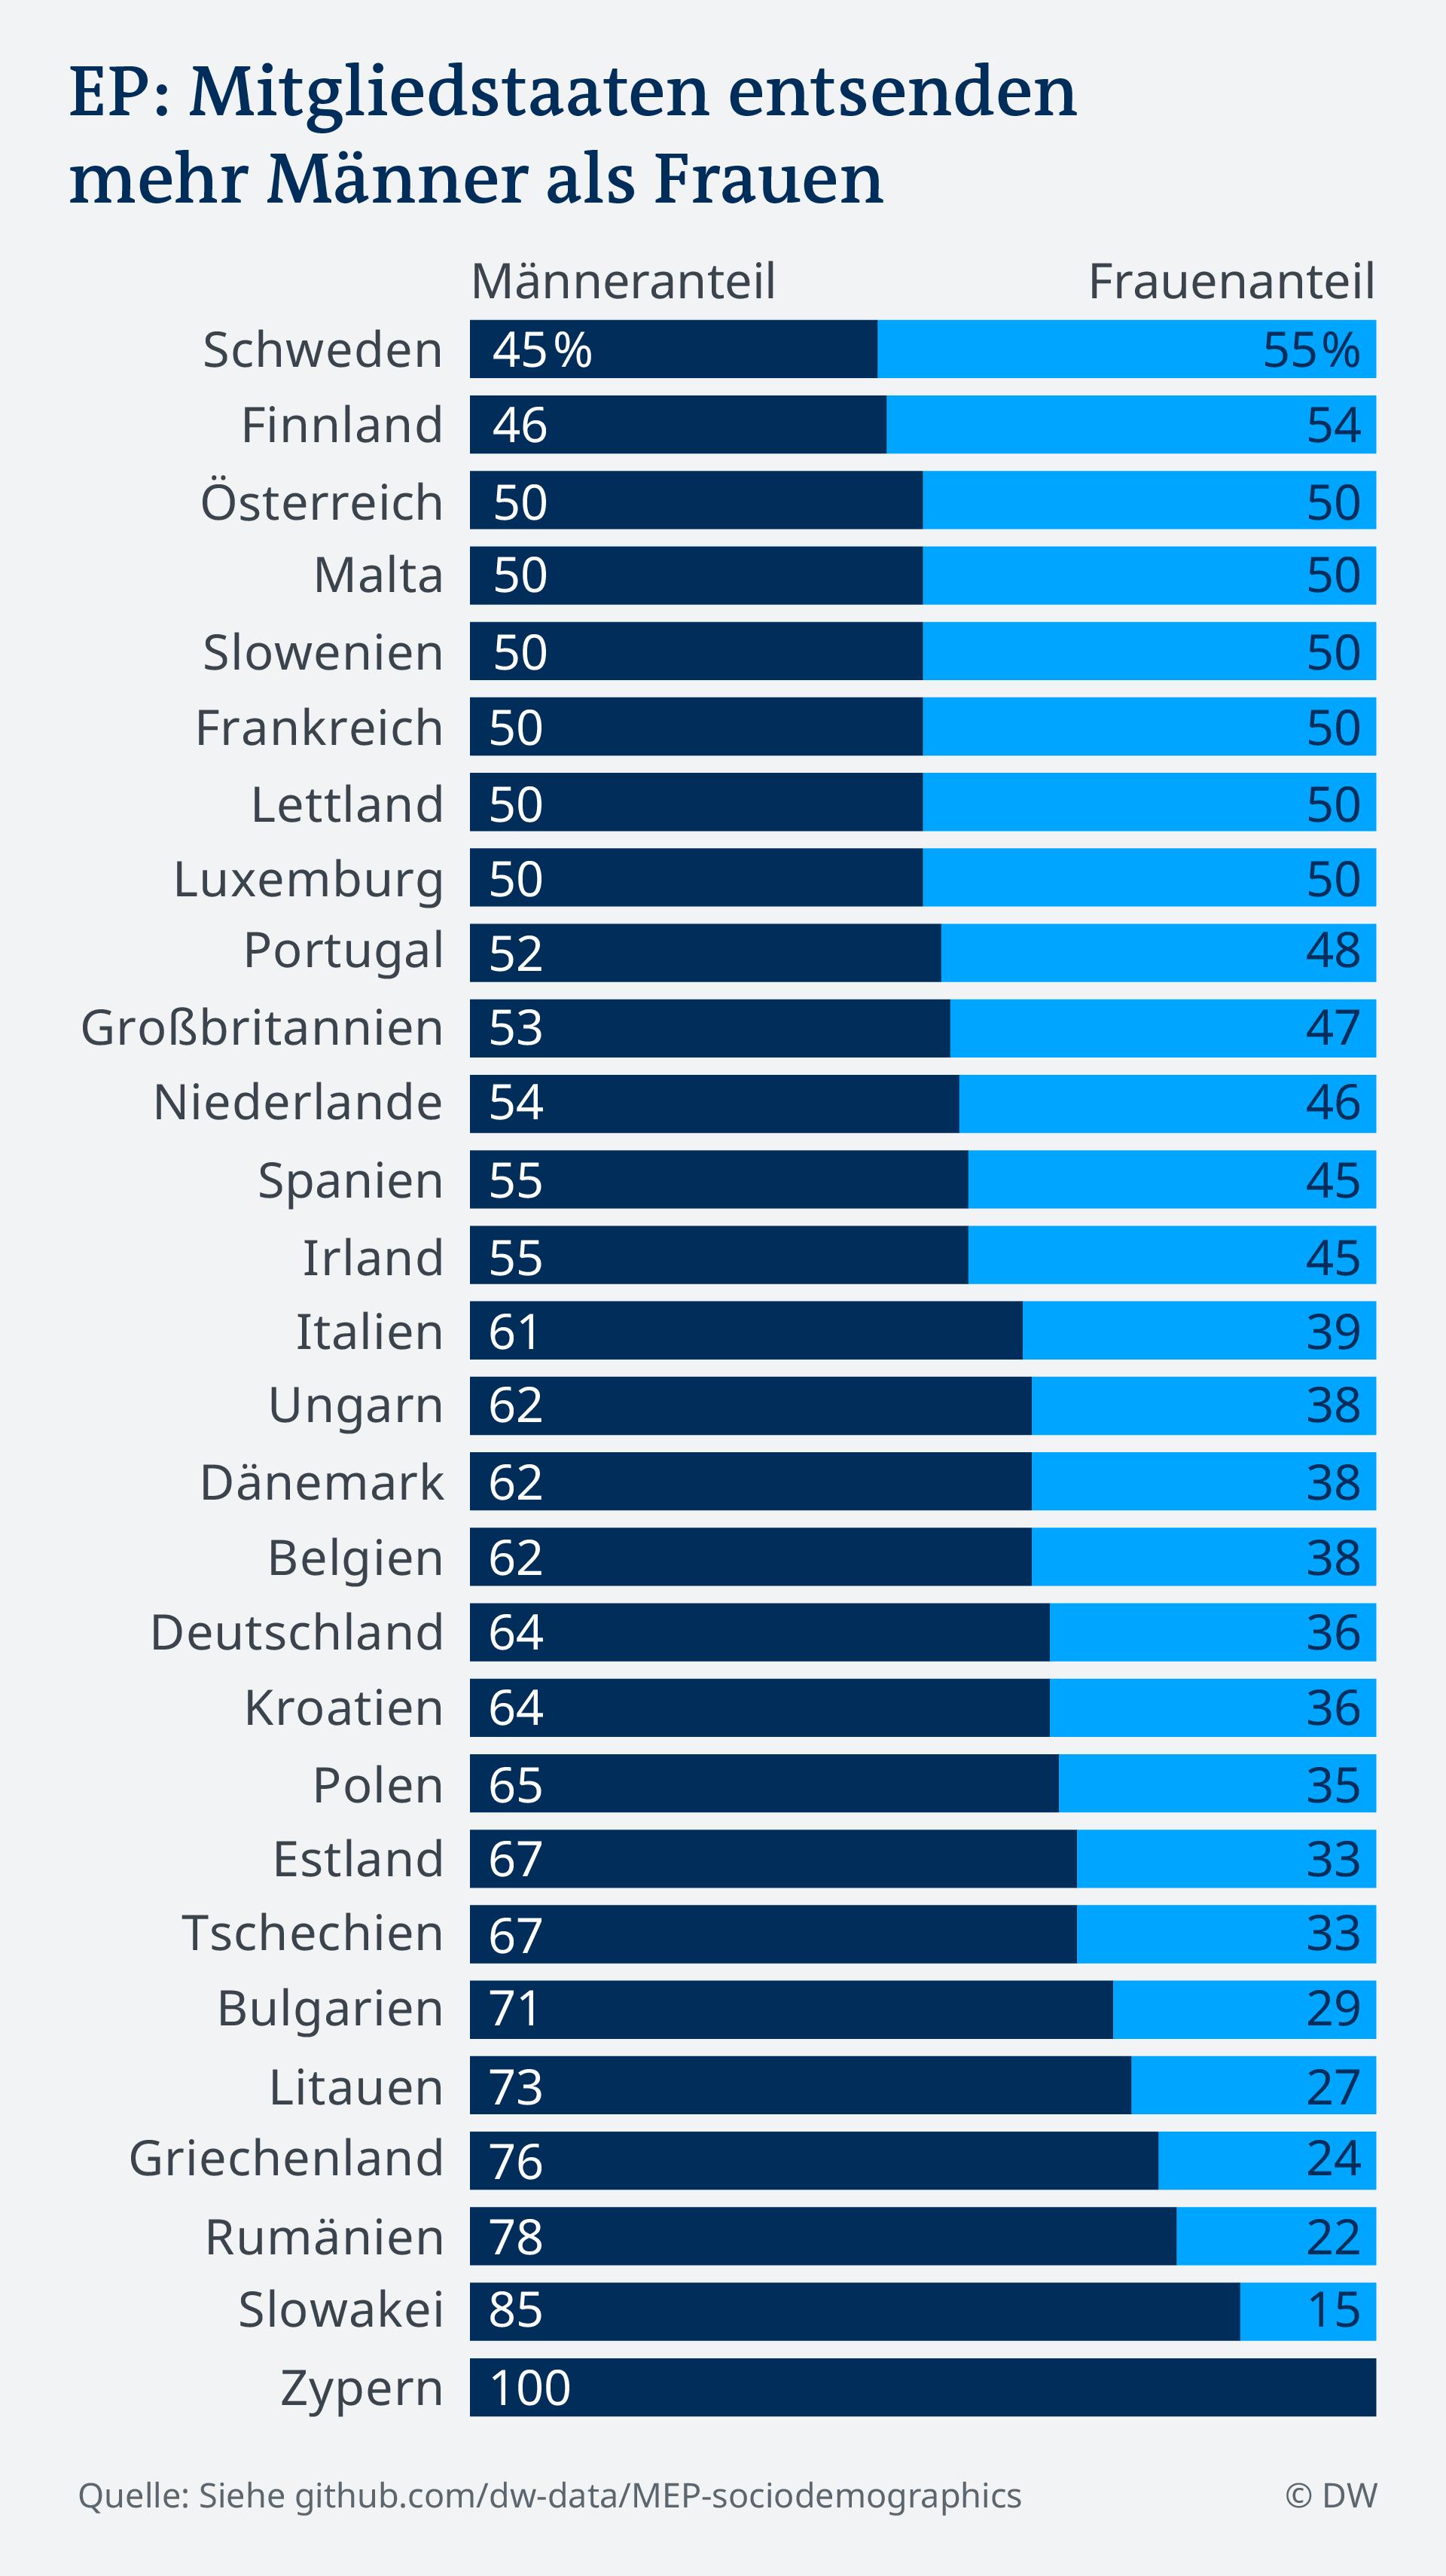 Datenvisualisierung DE EU Parlament Sozidemografie Frauenanteil nach Mitgliedstaat Data visualization